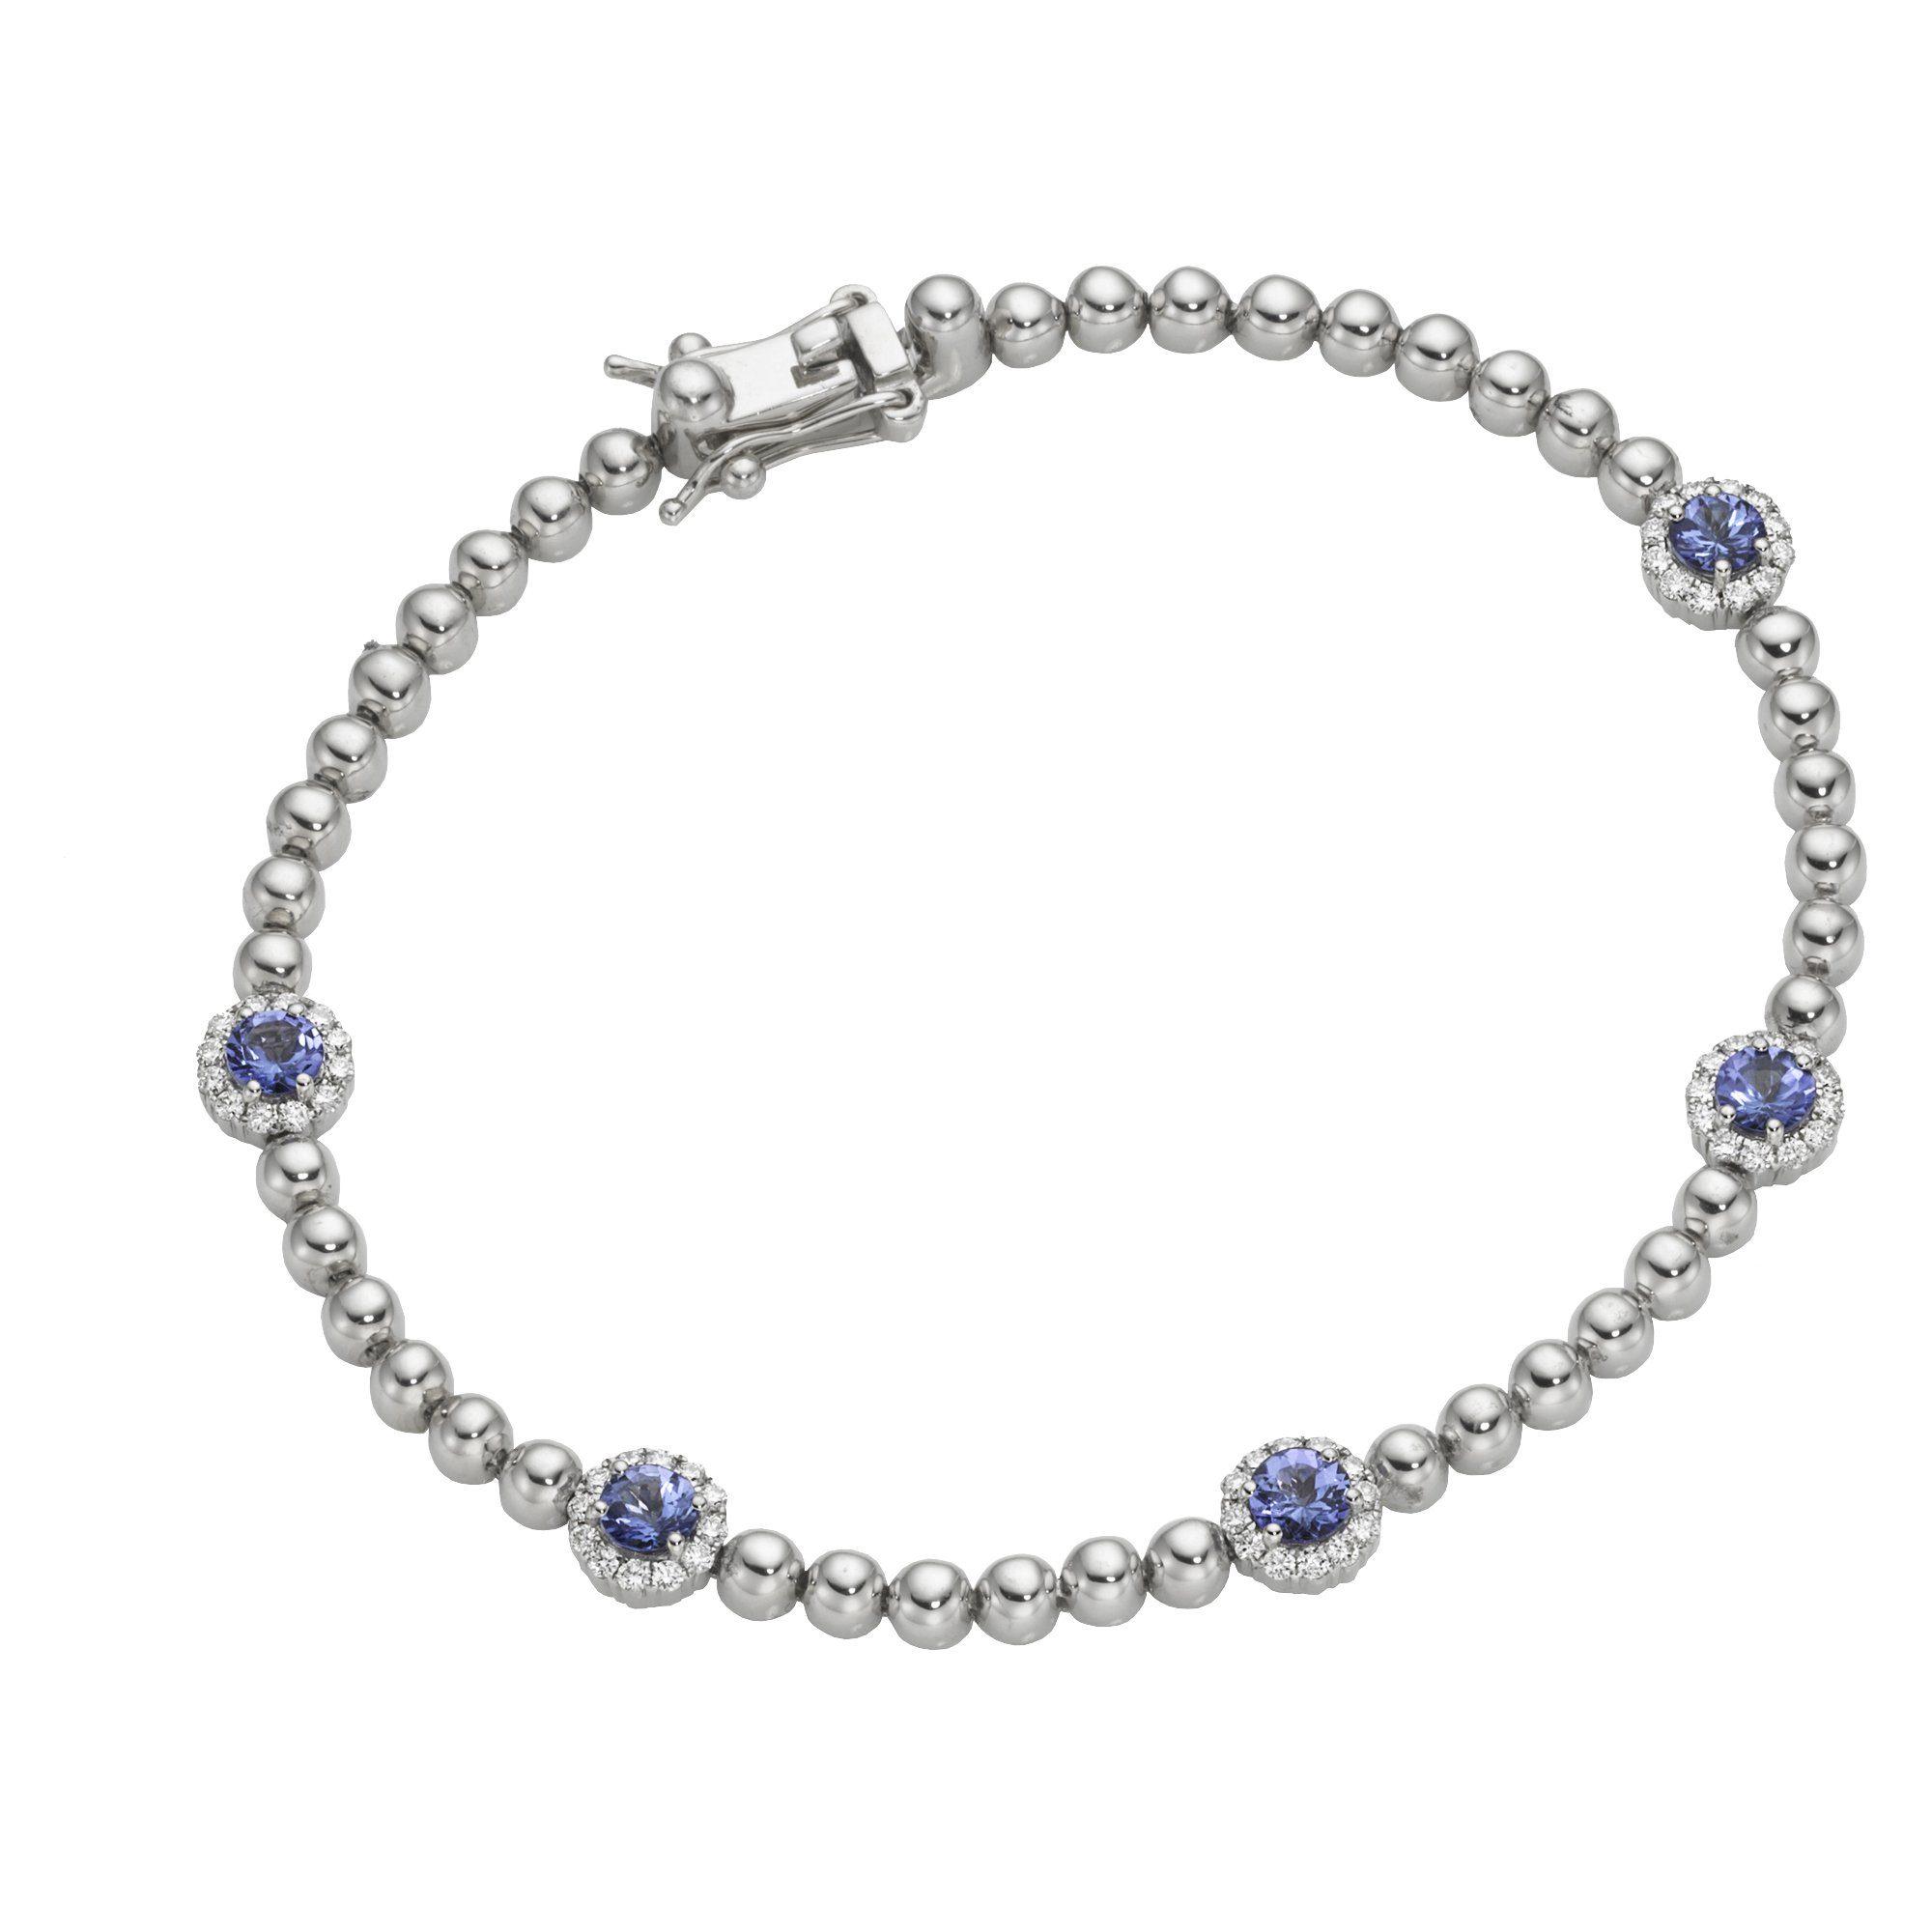 creazione bijoux armband - 600PCS Orange&Light Blue 2-Segment DIY Twistz Silicone Rubber Bands for Rainbow Loom Bracelets with Hook&S-clips , MiniInTheBox